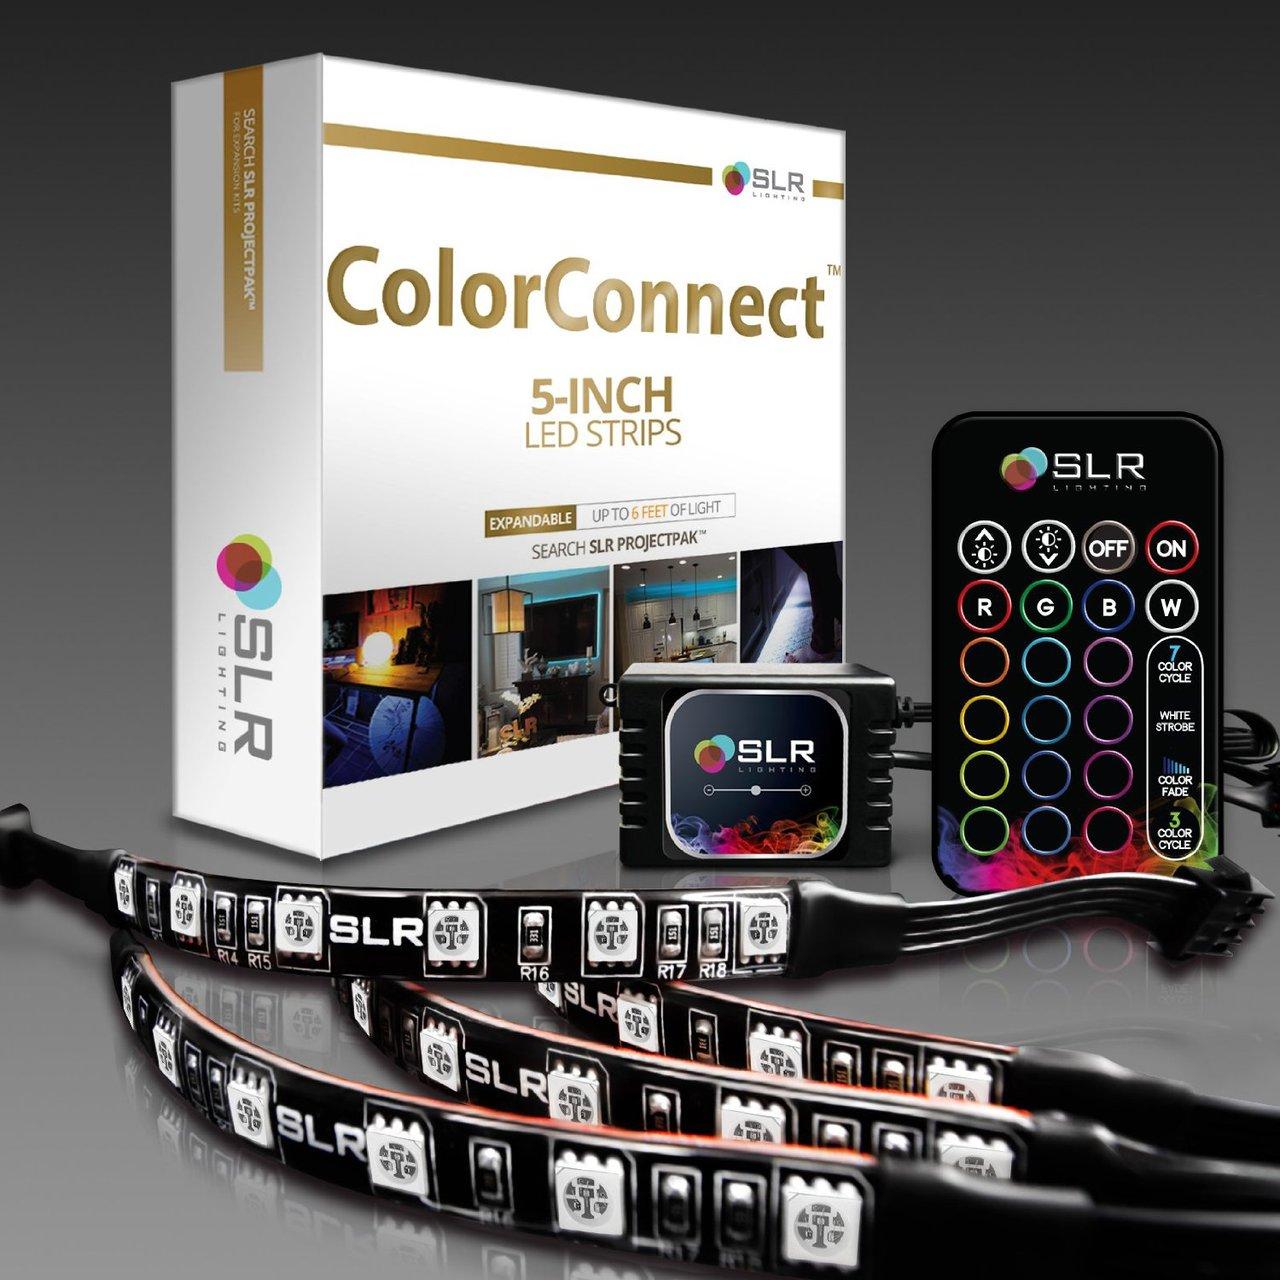 home led accent lighting. Rgb Led Light Kit For Home Accent Lighting L